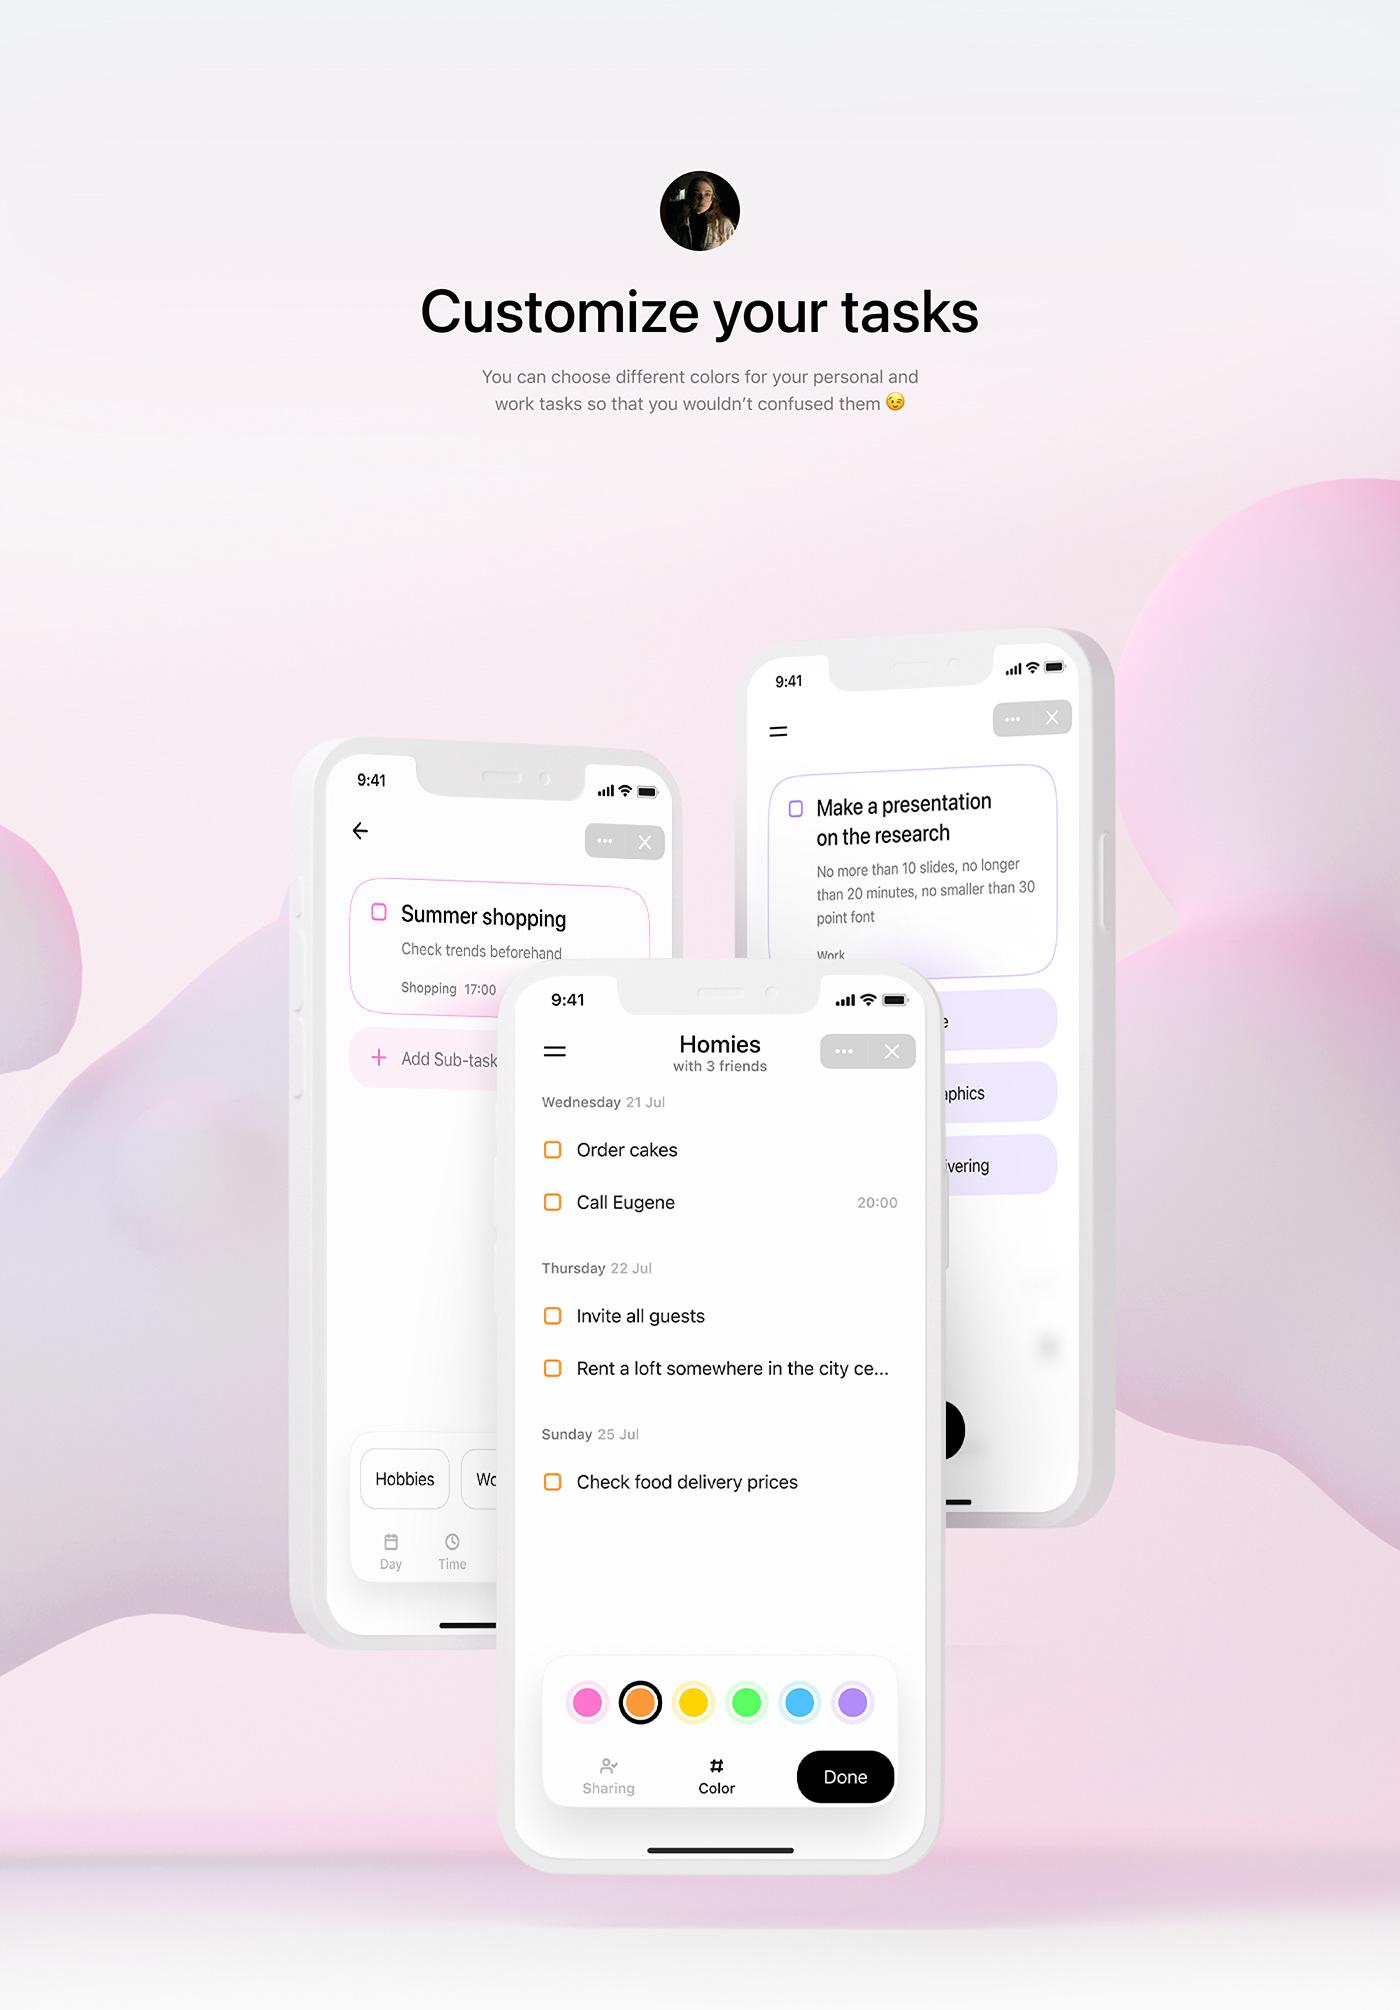 application Experience mobile Mobile app ui design UI/UX user interface ux